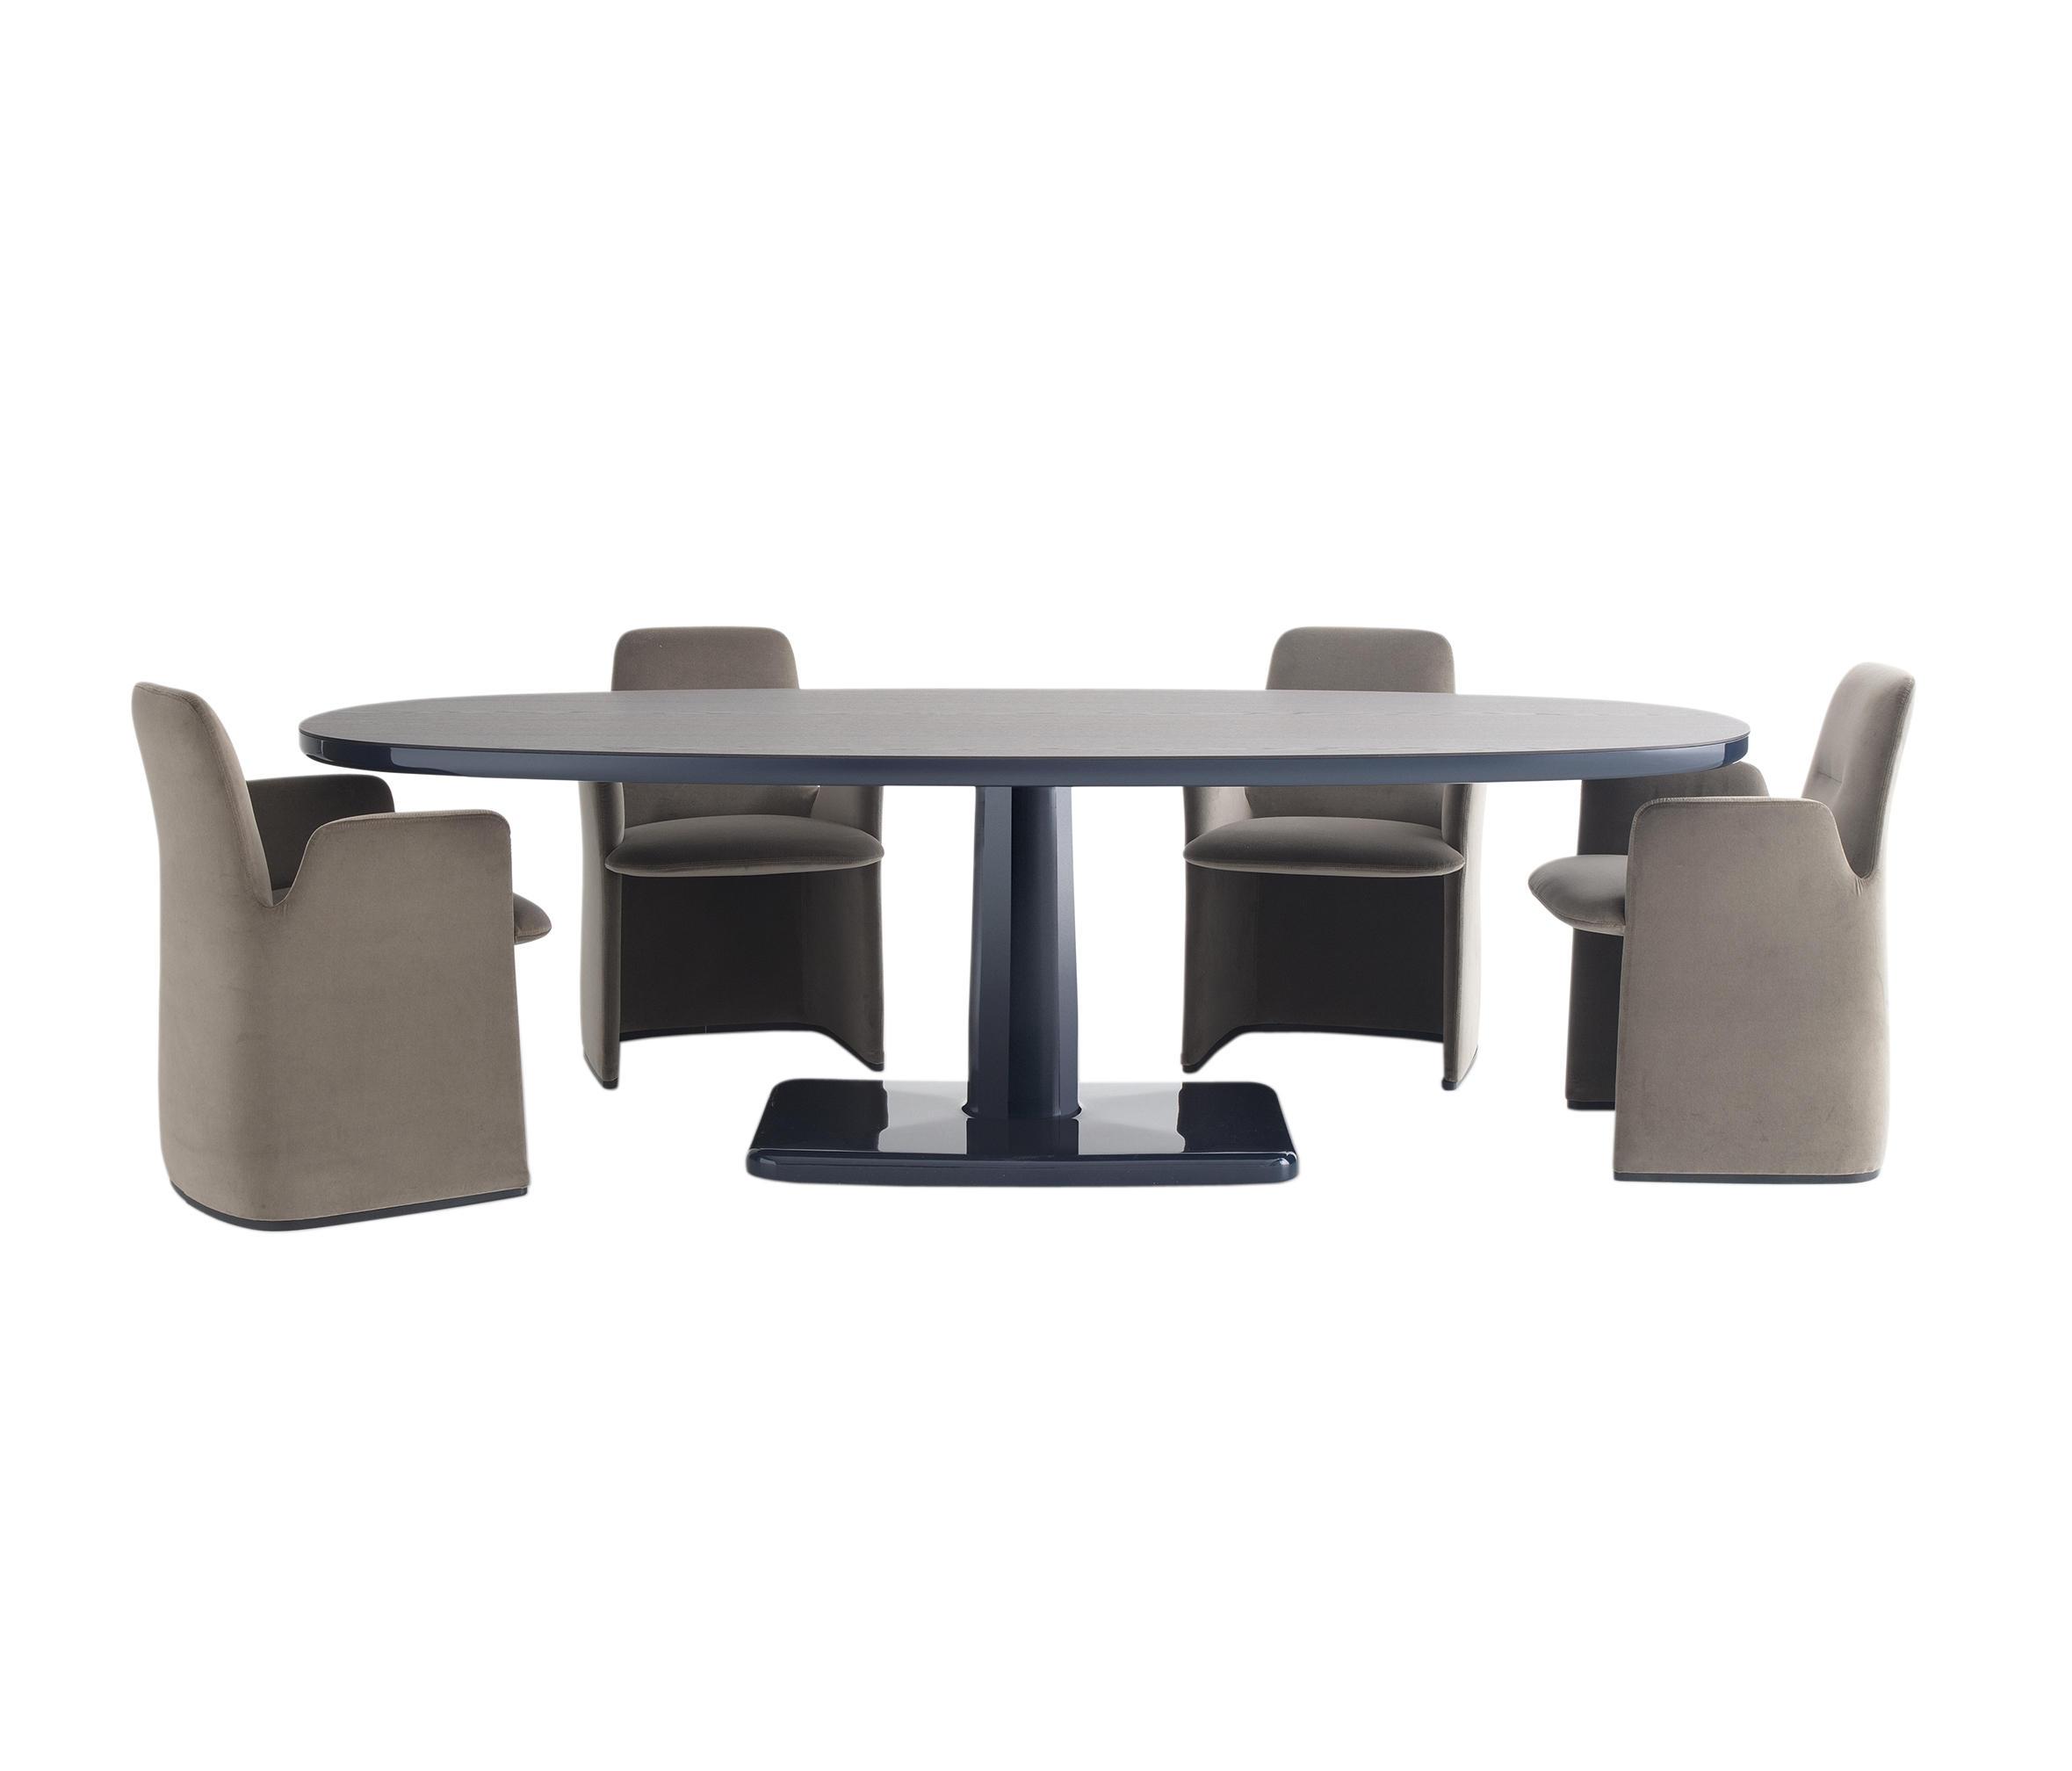 Canova Table By Poliform